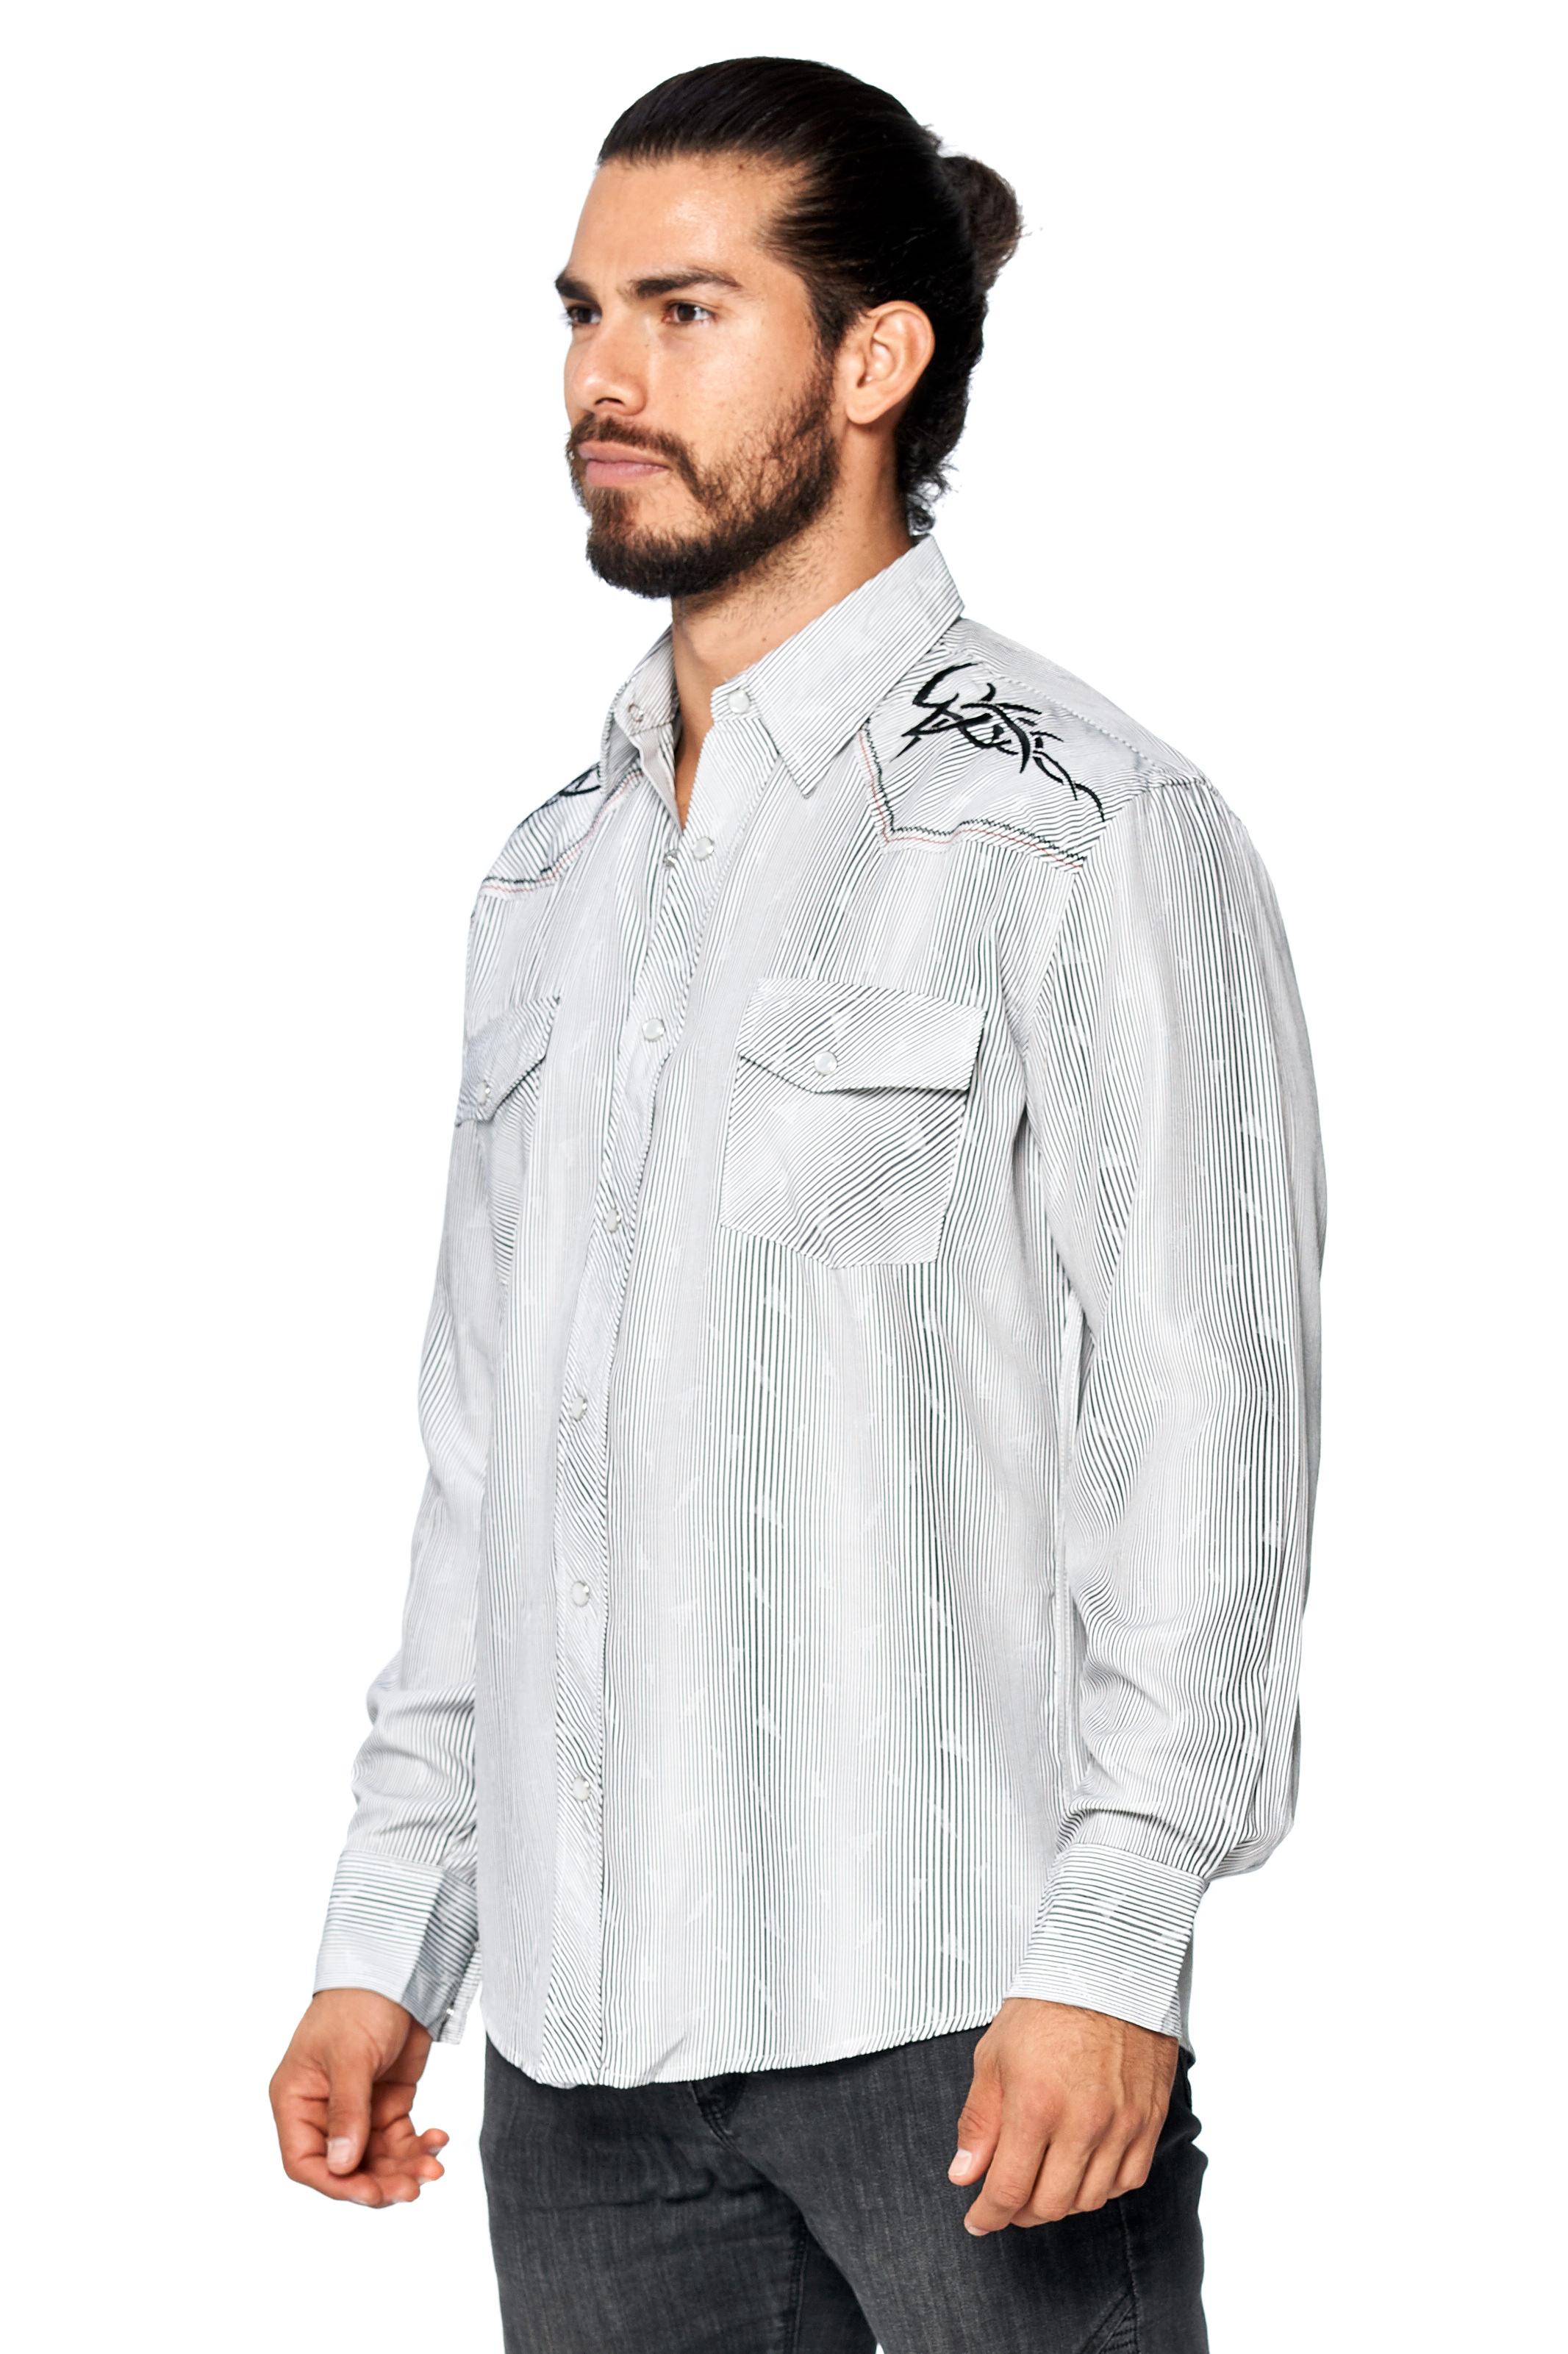 LW-Men-039-s-Pearl-Snap-Tribal-Stylish-Printed-Woven-Western-Vaquero-Rodeo-Shirt thumbnail 62